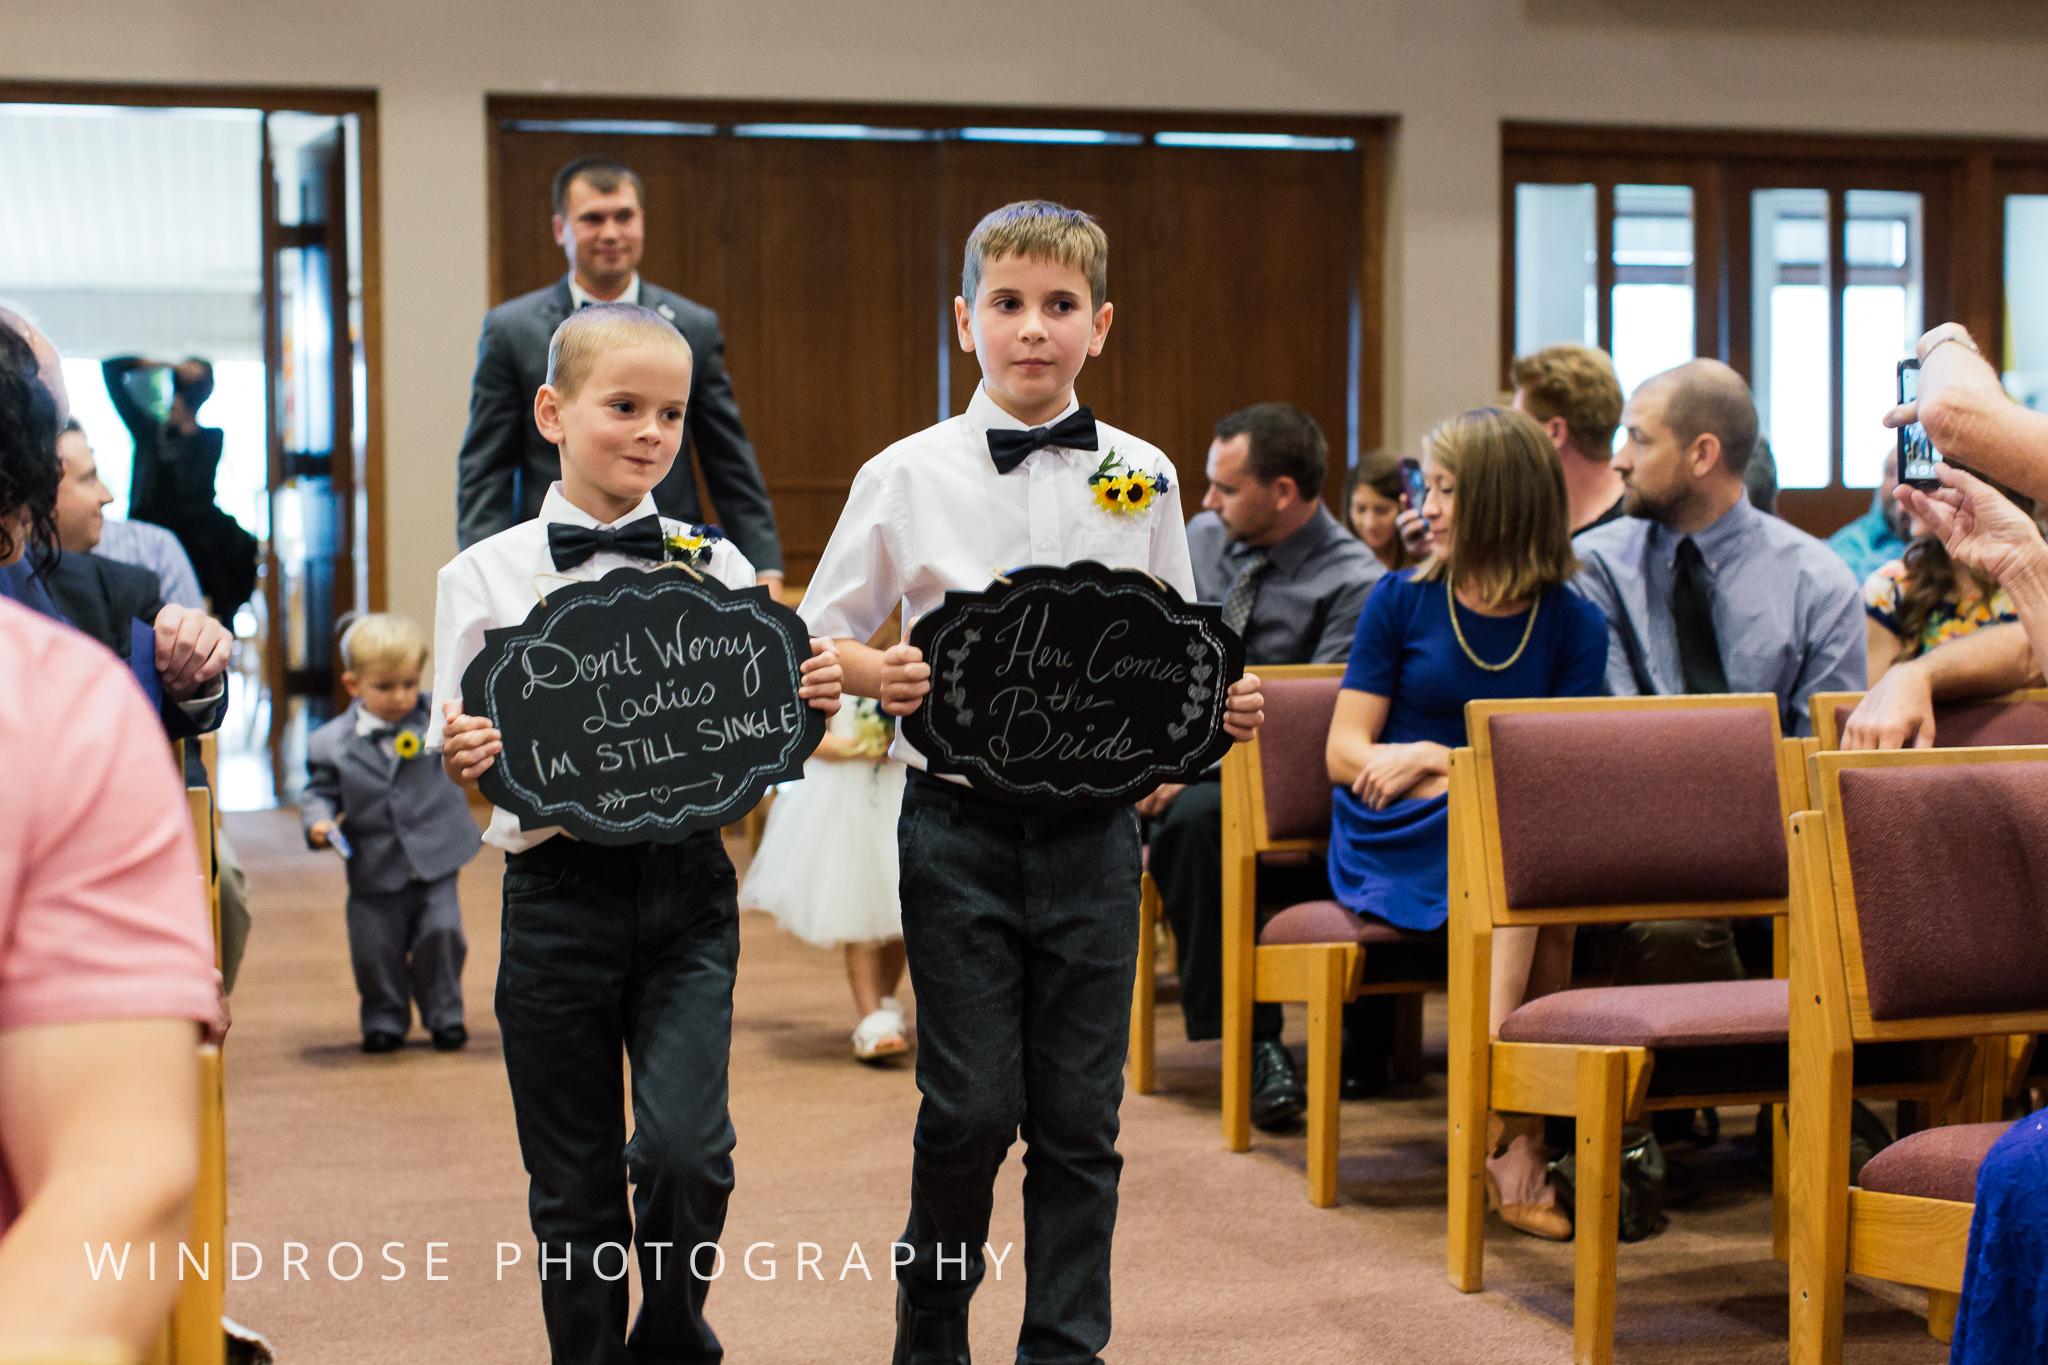 La-Crosse-Country-Club-Wedding-Minnesota-Wedding-Photographer-19.jpg